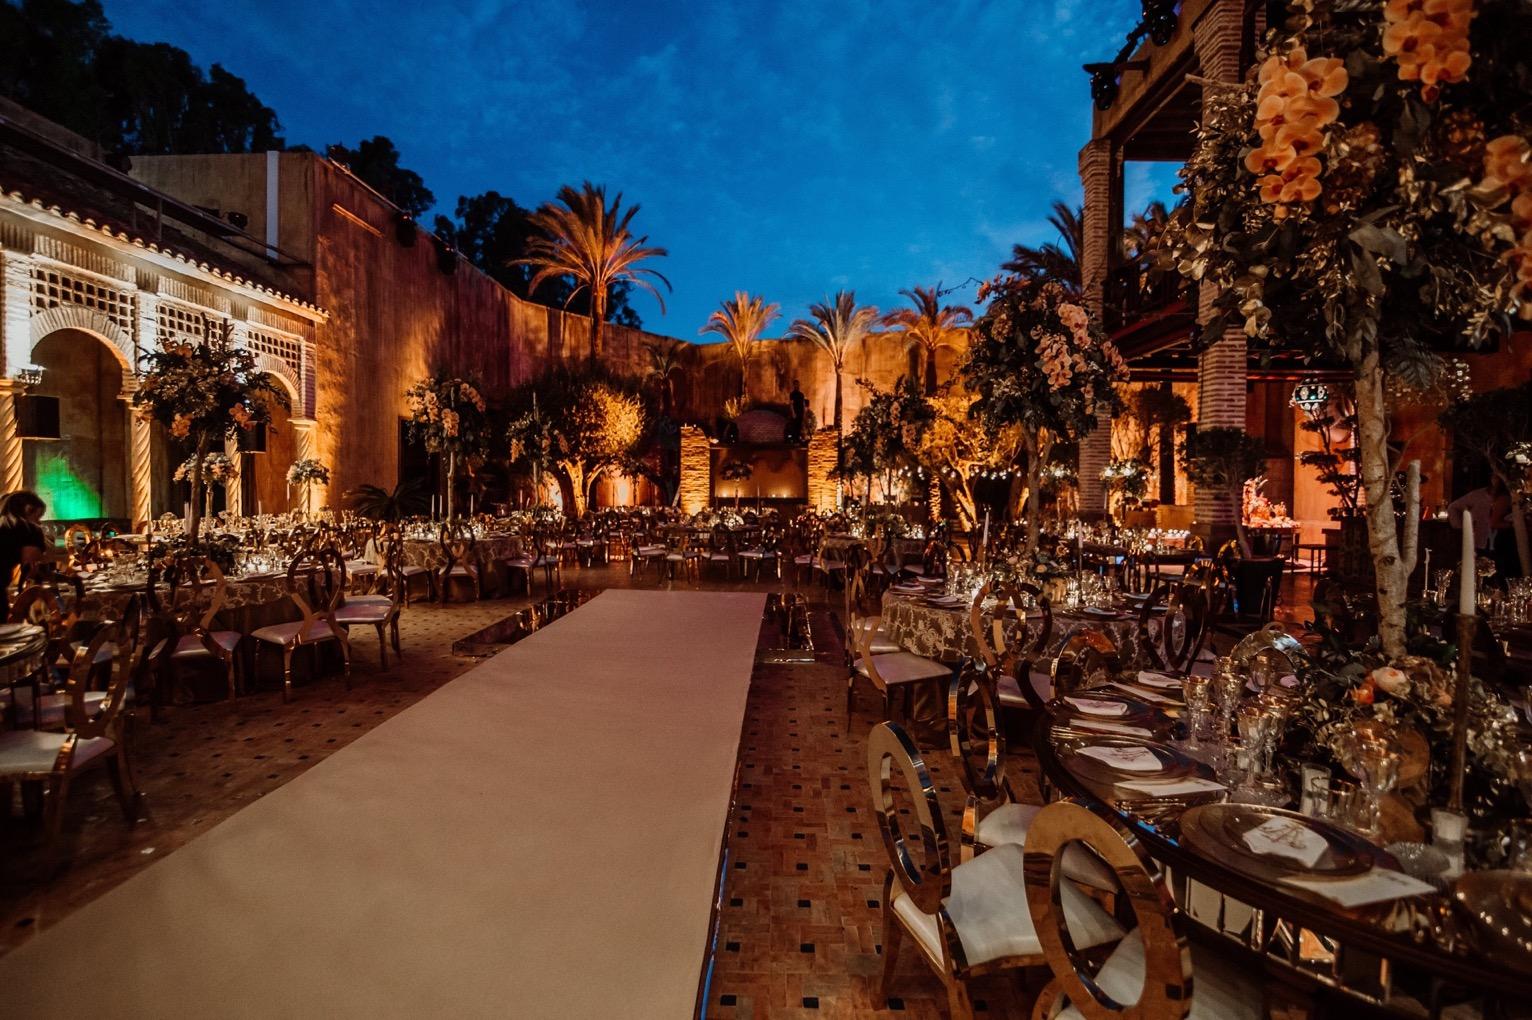 Si-Quiero-Wedding-Planner-By-Sira-Antequera-Bodas-Málaga-Marbella-Miami-L-A-16